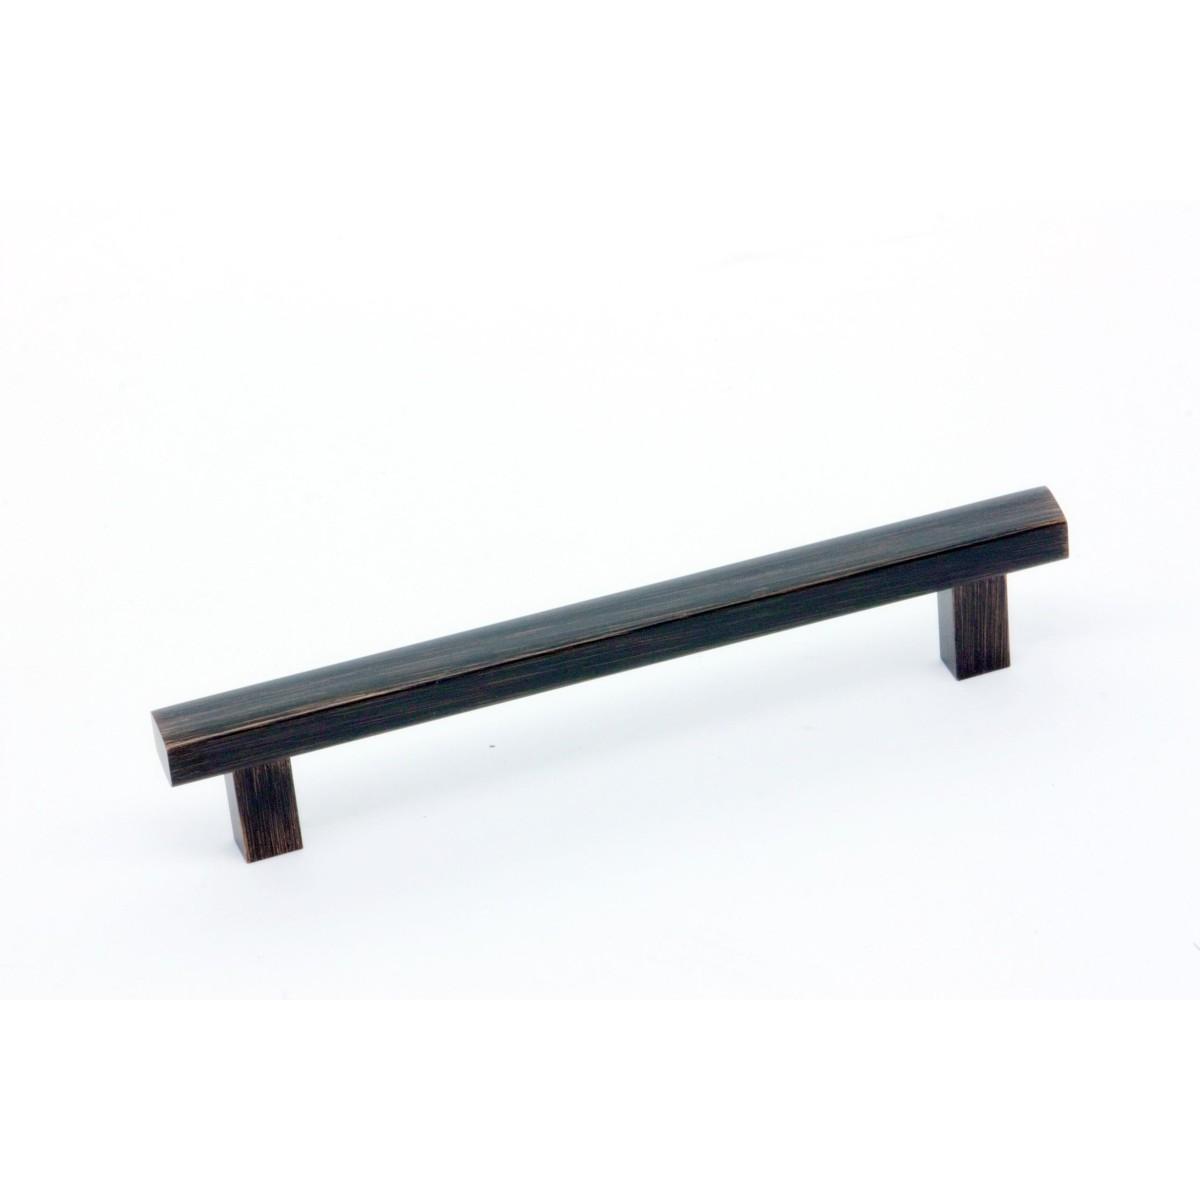 Ручка-Скоба Inred In011133128borb Брашированная Античная Медь